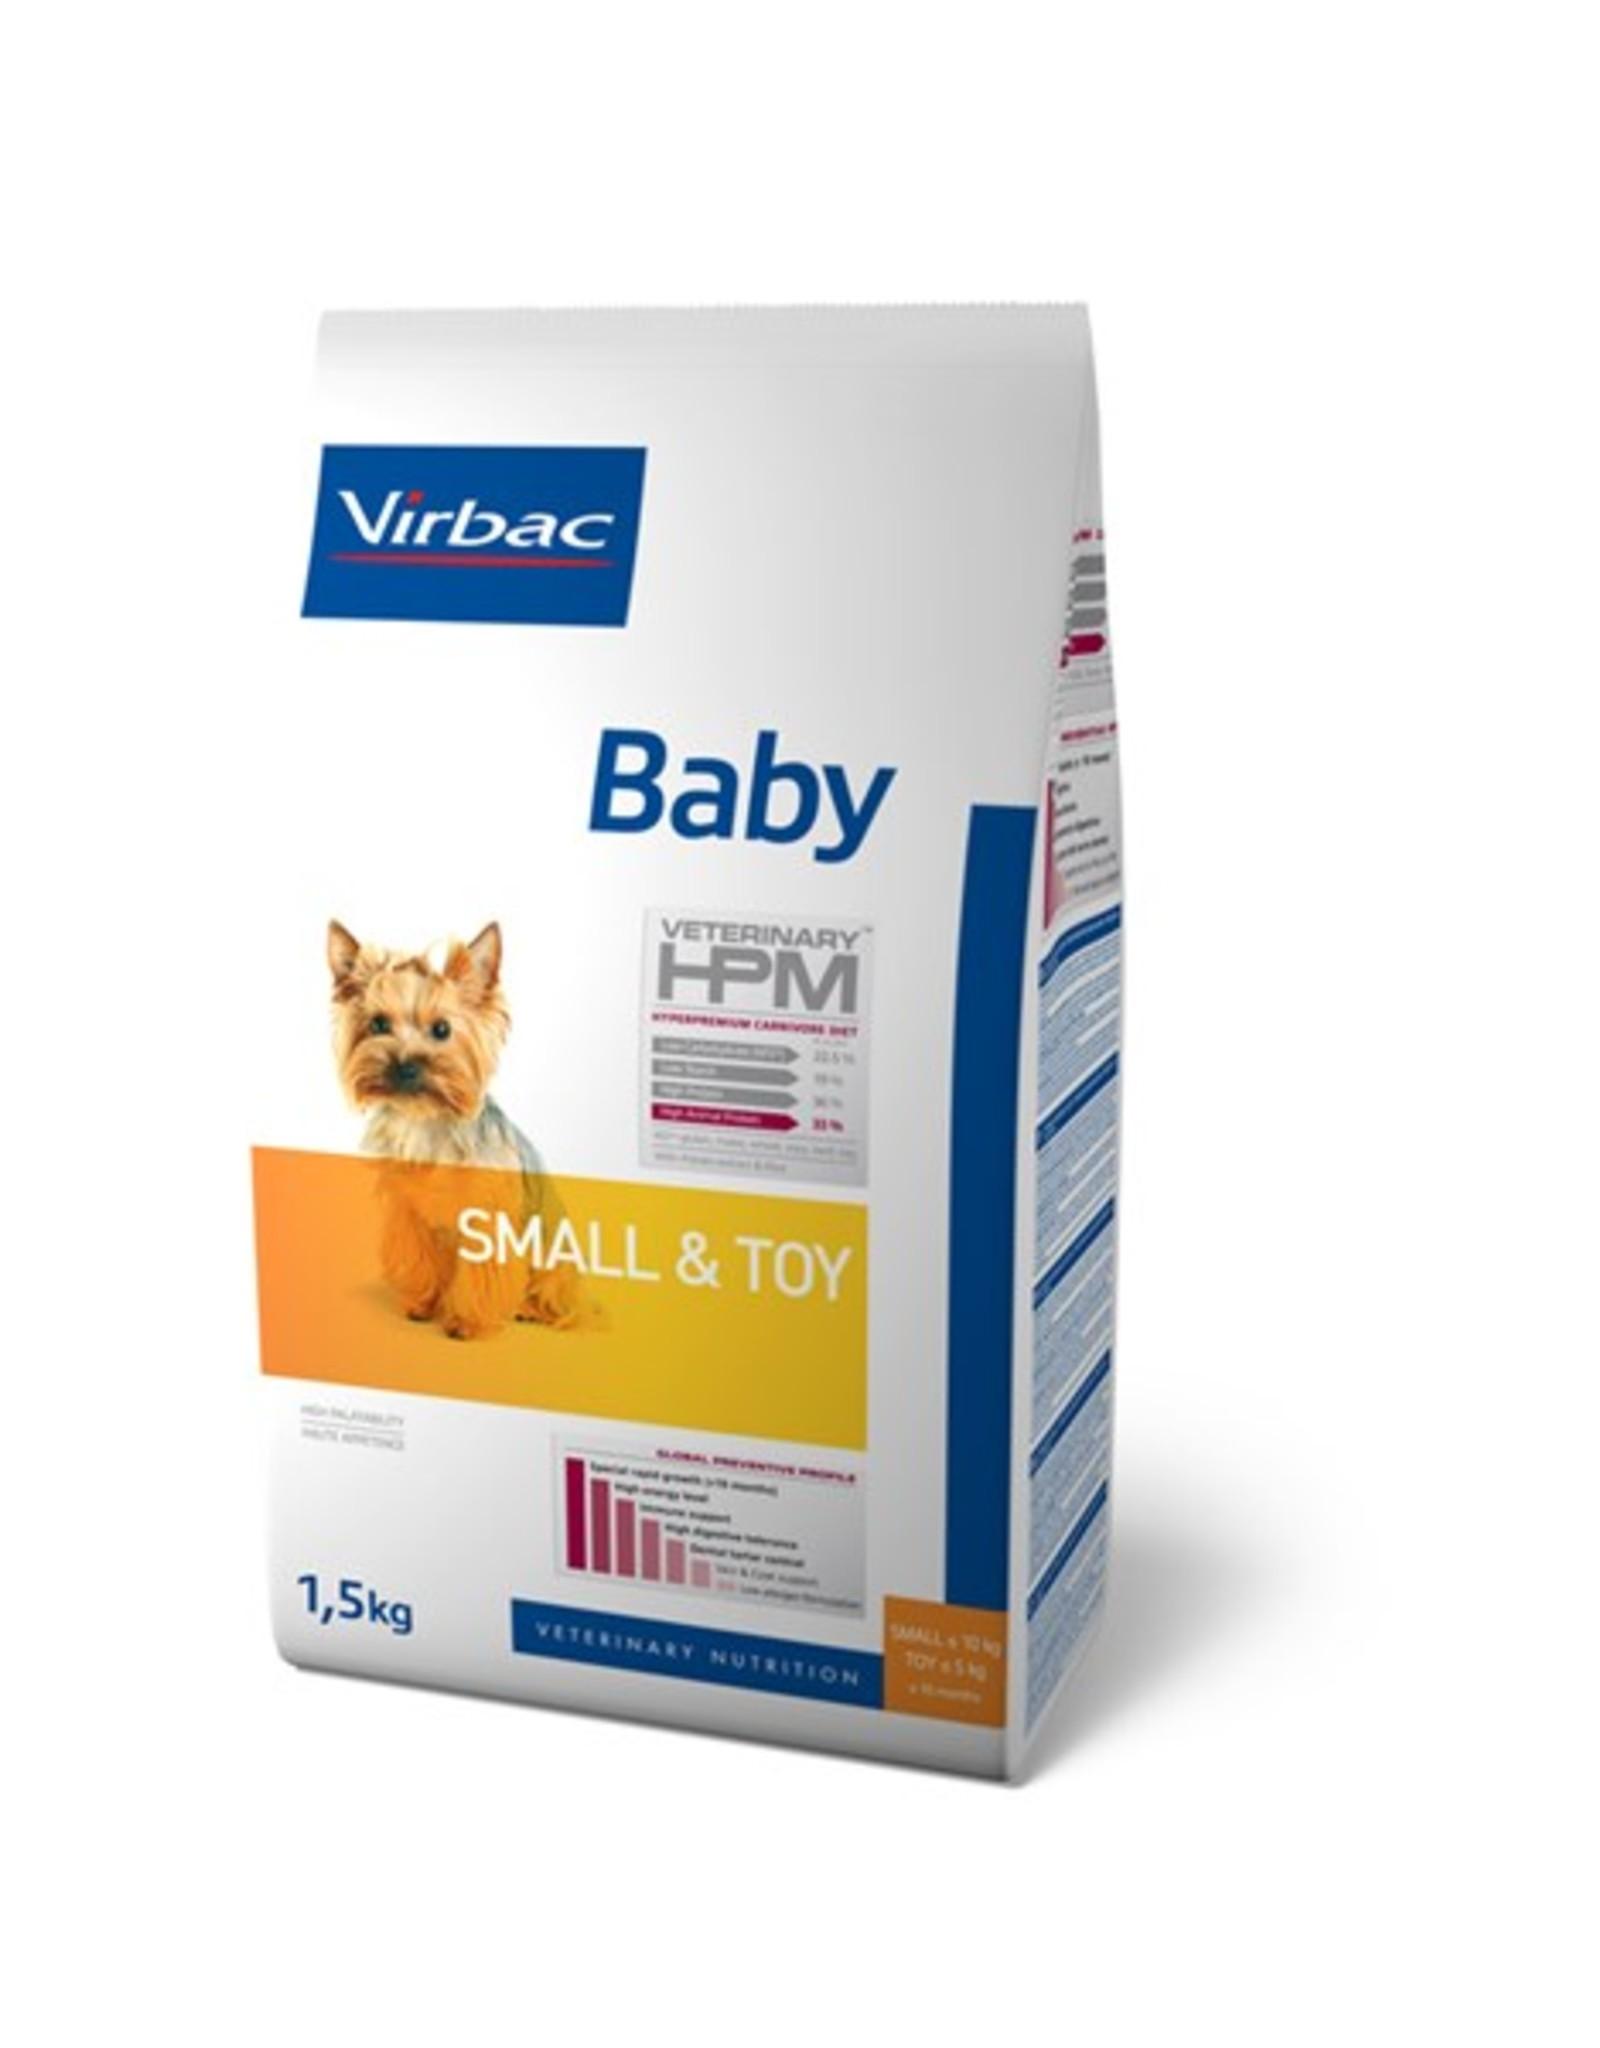 Virbac Virbac Hpm Hond Baby Small Breed/toy 3kg